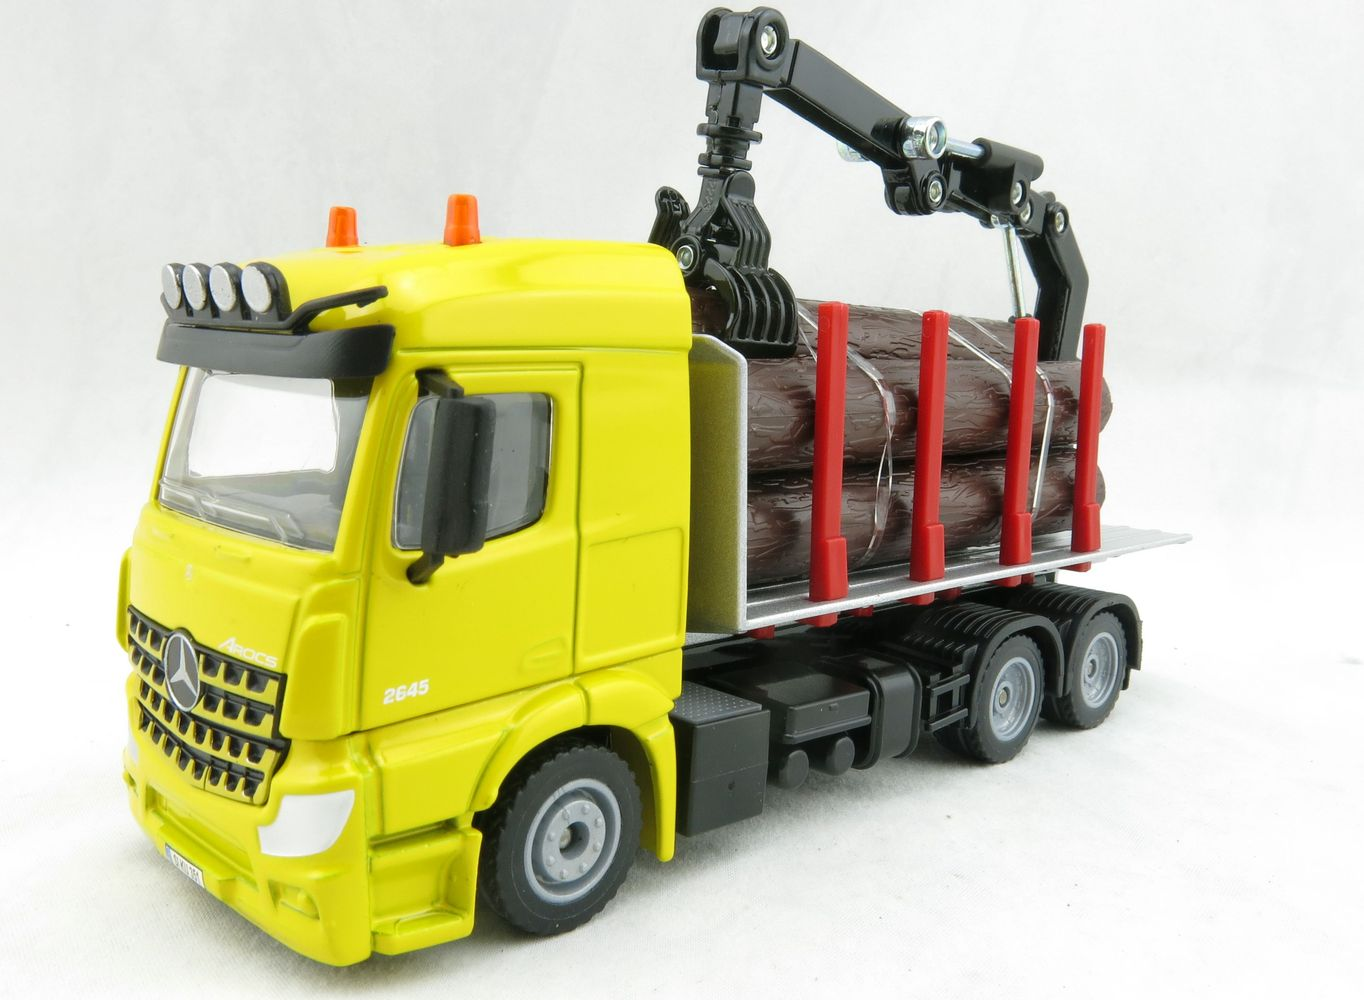 Product Image - Siku 2714 - Mercedes-Benz Acros Log Transporter Version  2018 - Scale